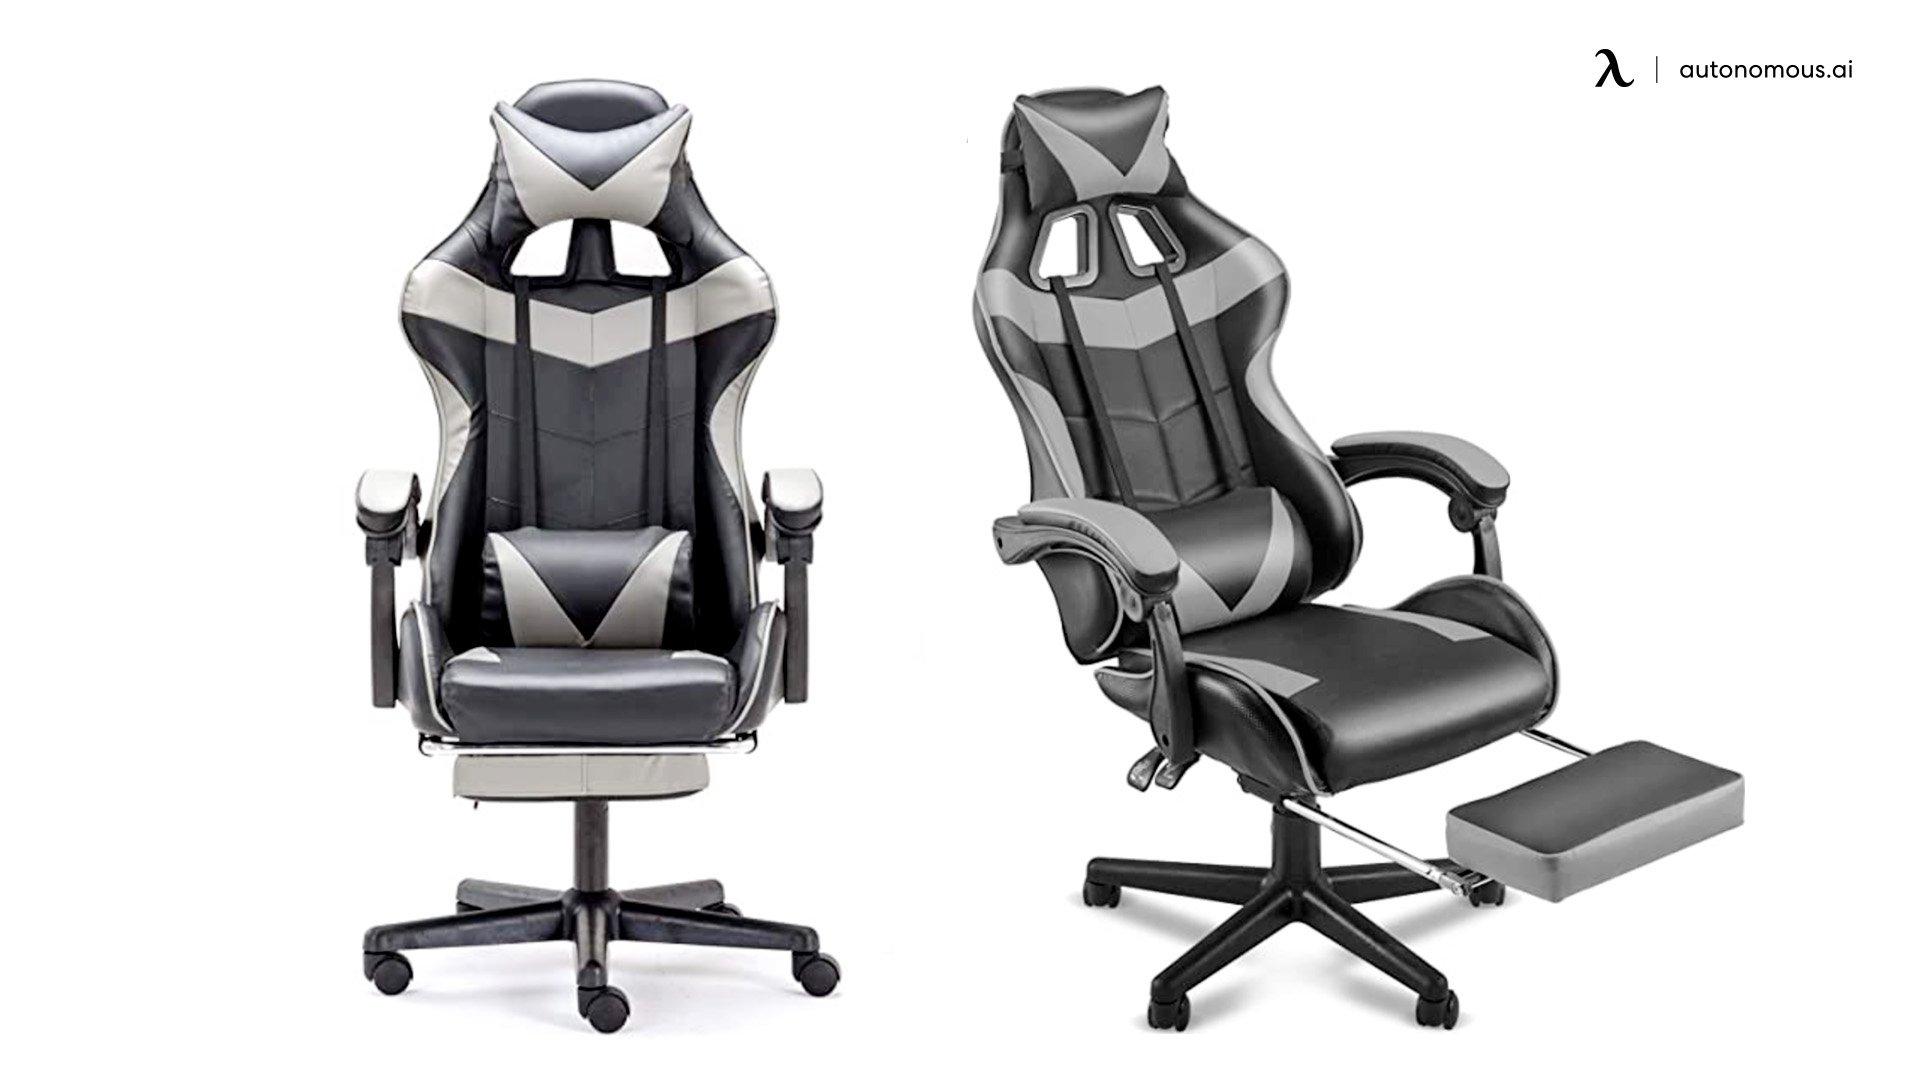 Soontrans Ergonomic Gaming Chair